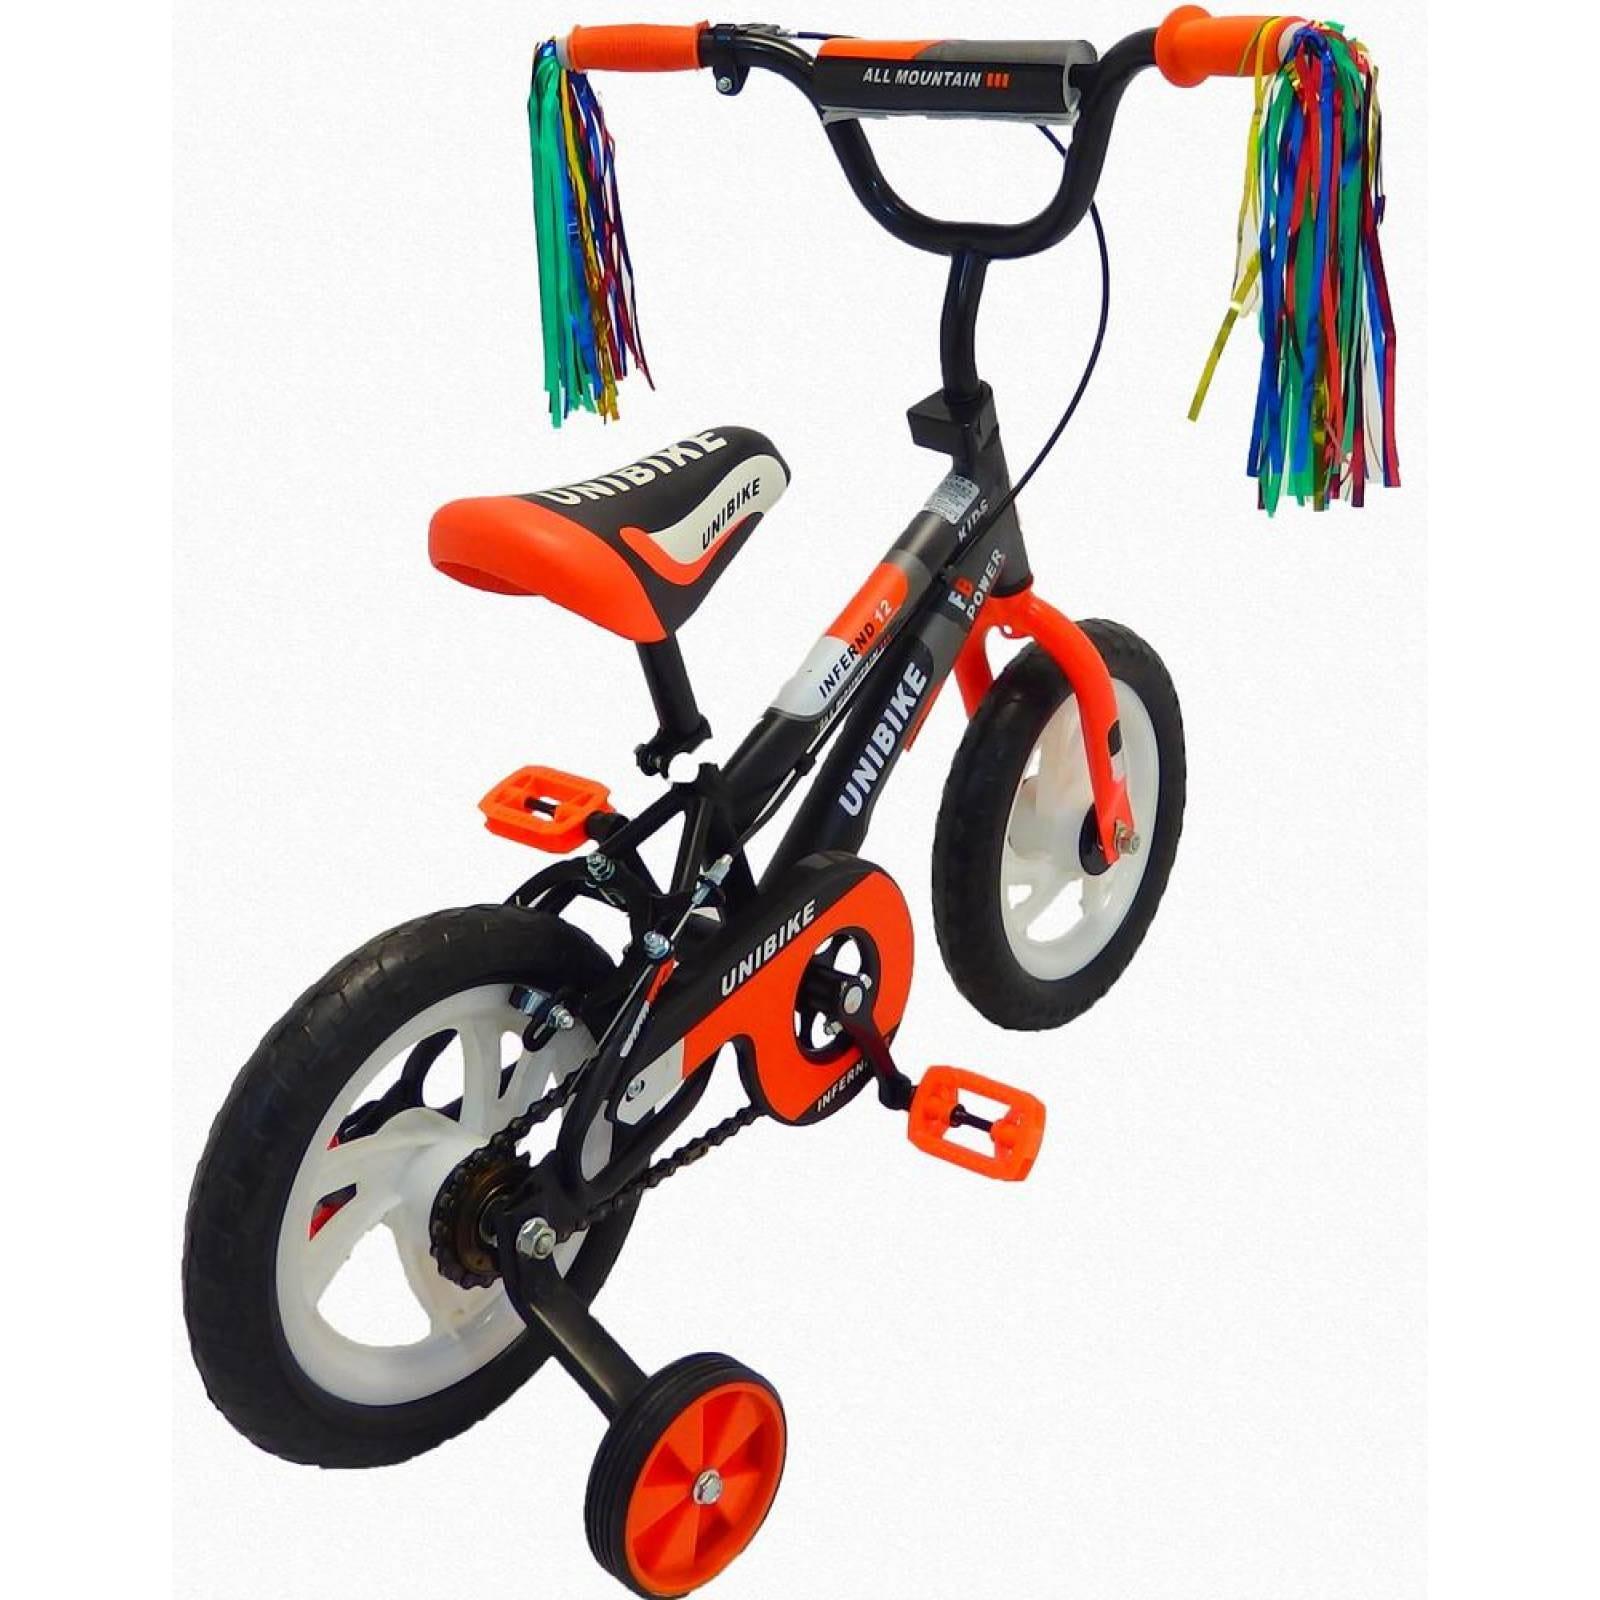 Bicicleta Infantil para niño Rodada 12 con llanta de goma Naranja